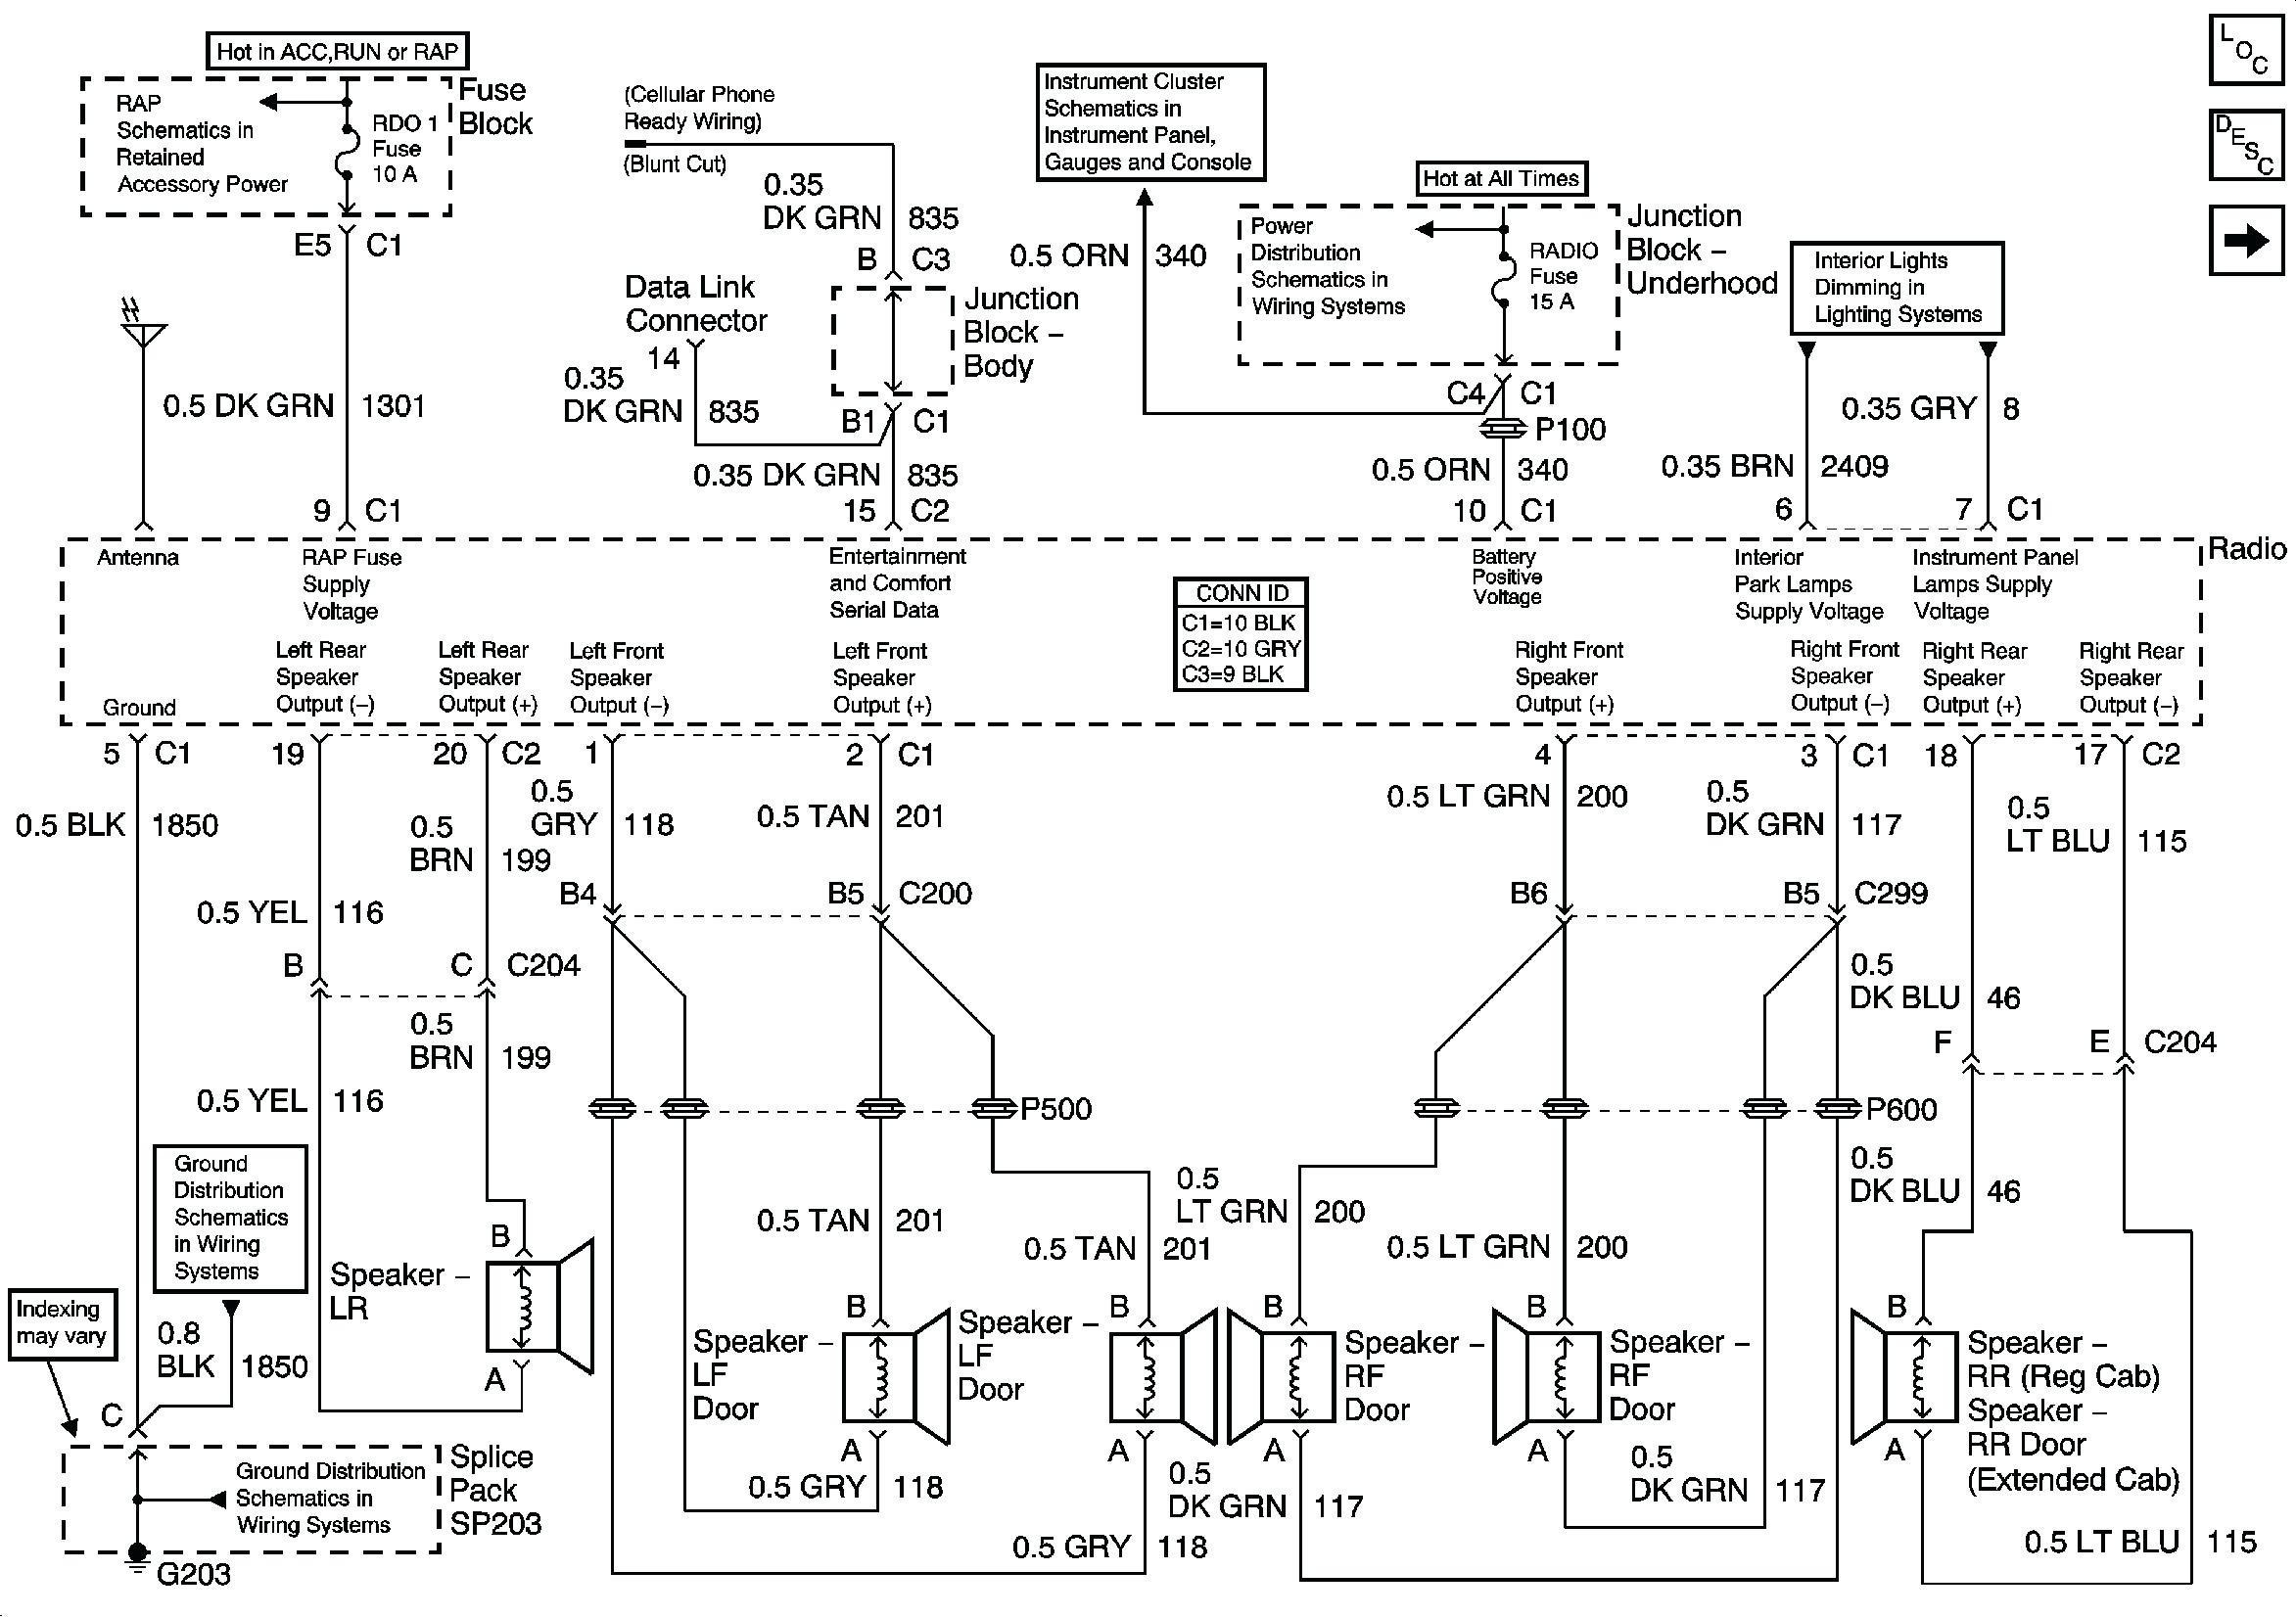 2005 Chevy Equinox Wiring Diagram Wiring Diagram 2005 Equinox Mirror Schematics Wiring Diagrams • Of 2005 Chevy Equinox Wiring Diagram